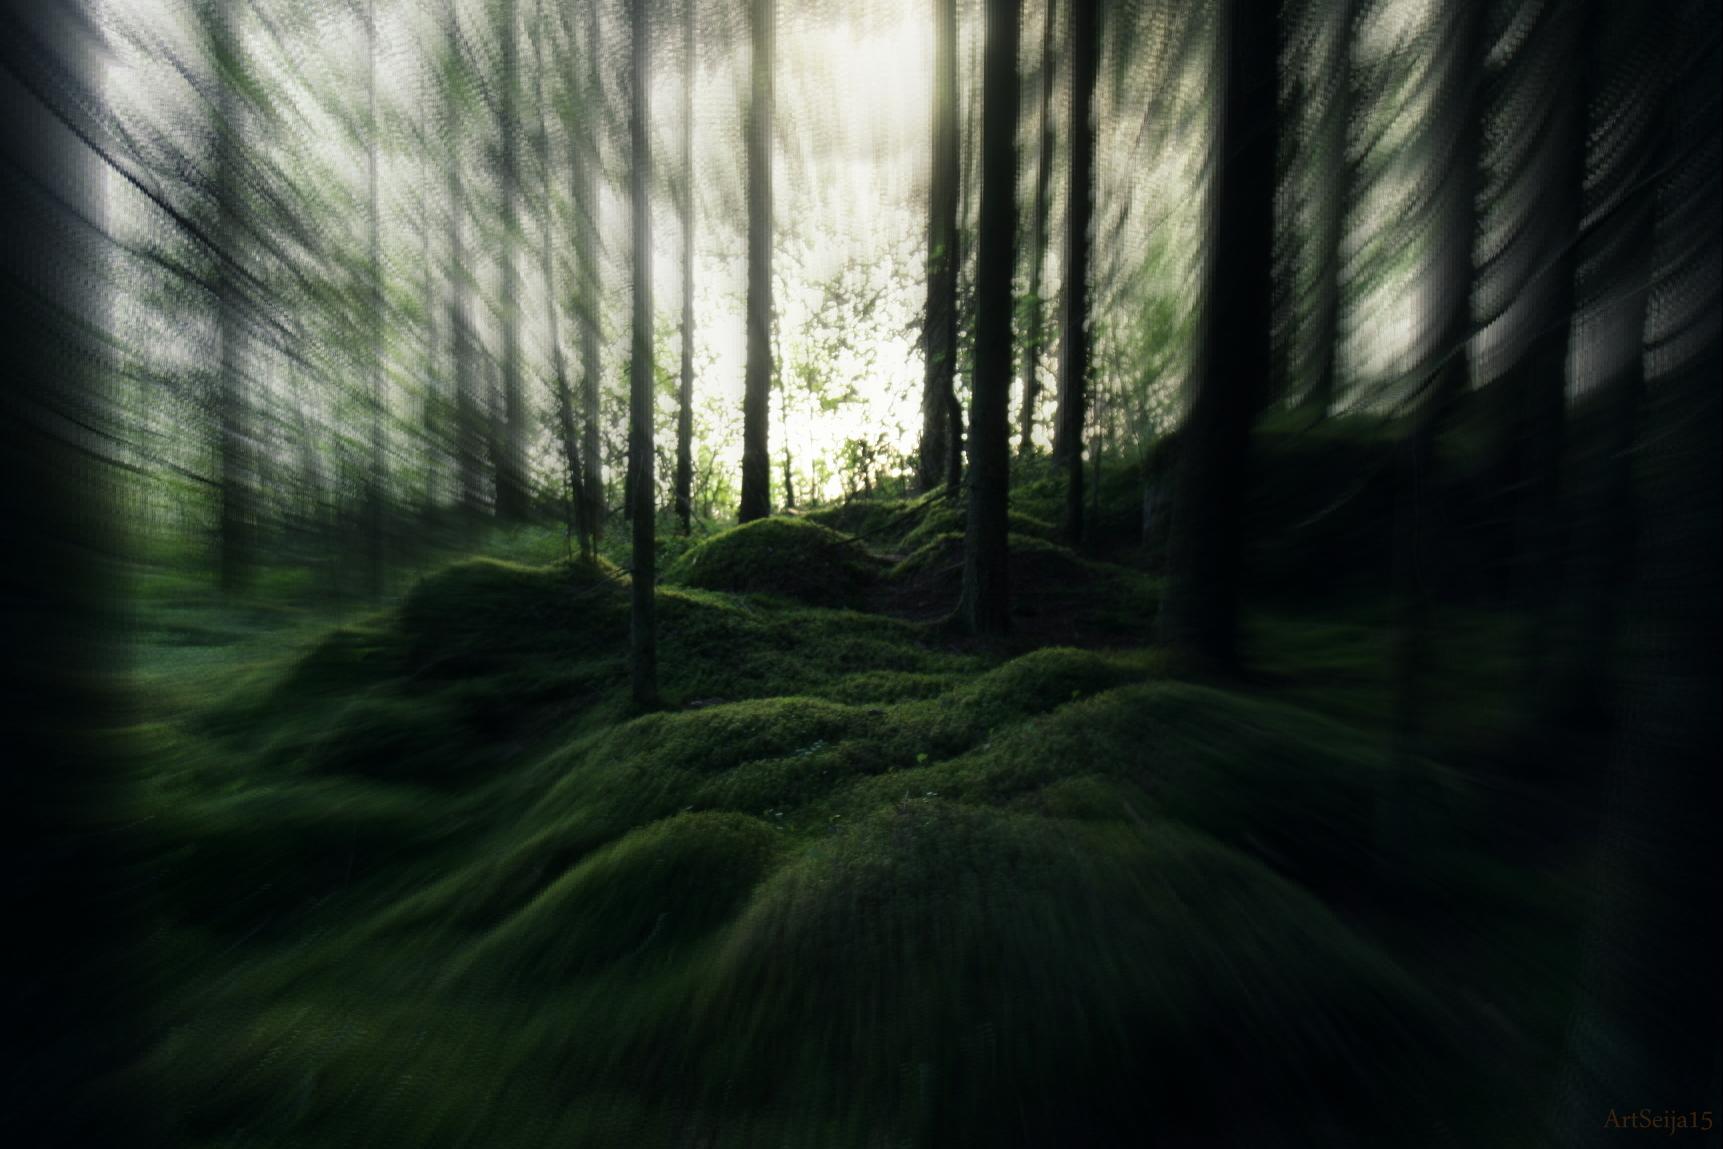 Metsän kuva: Lahmajärvi, Urjala